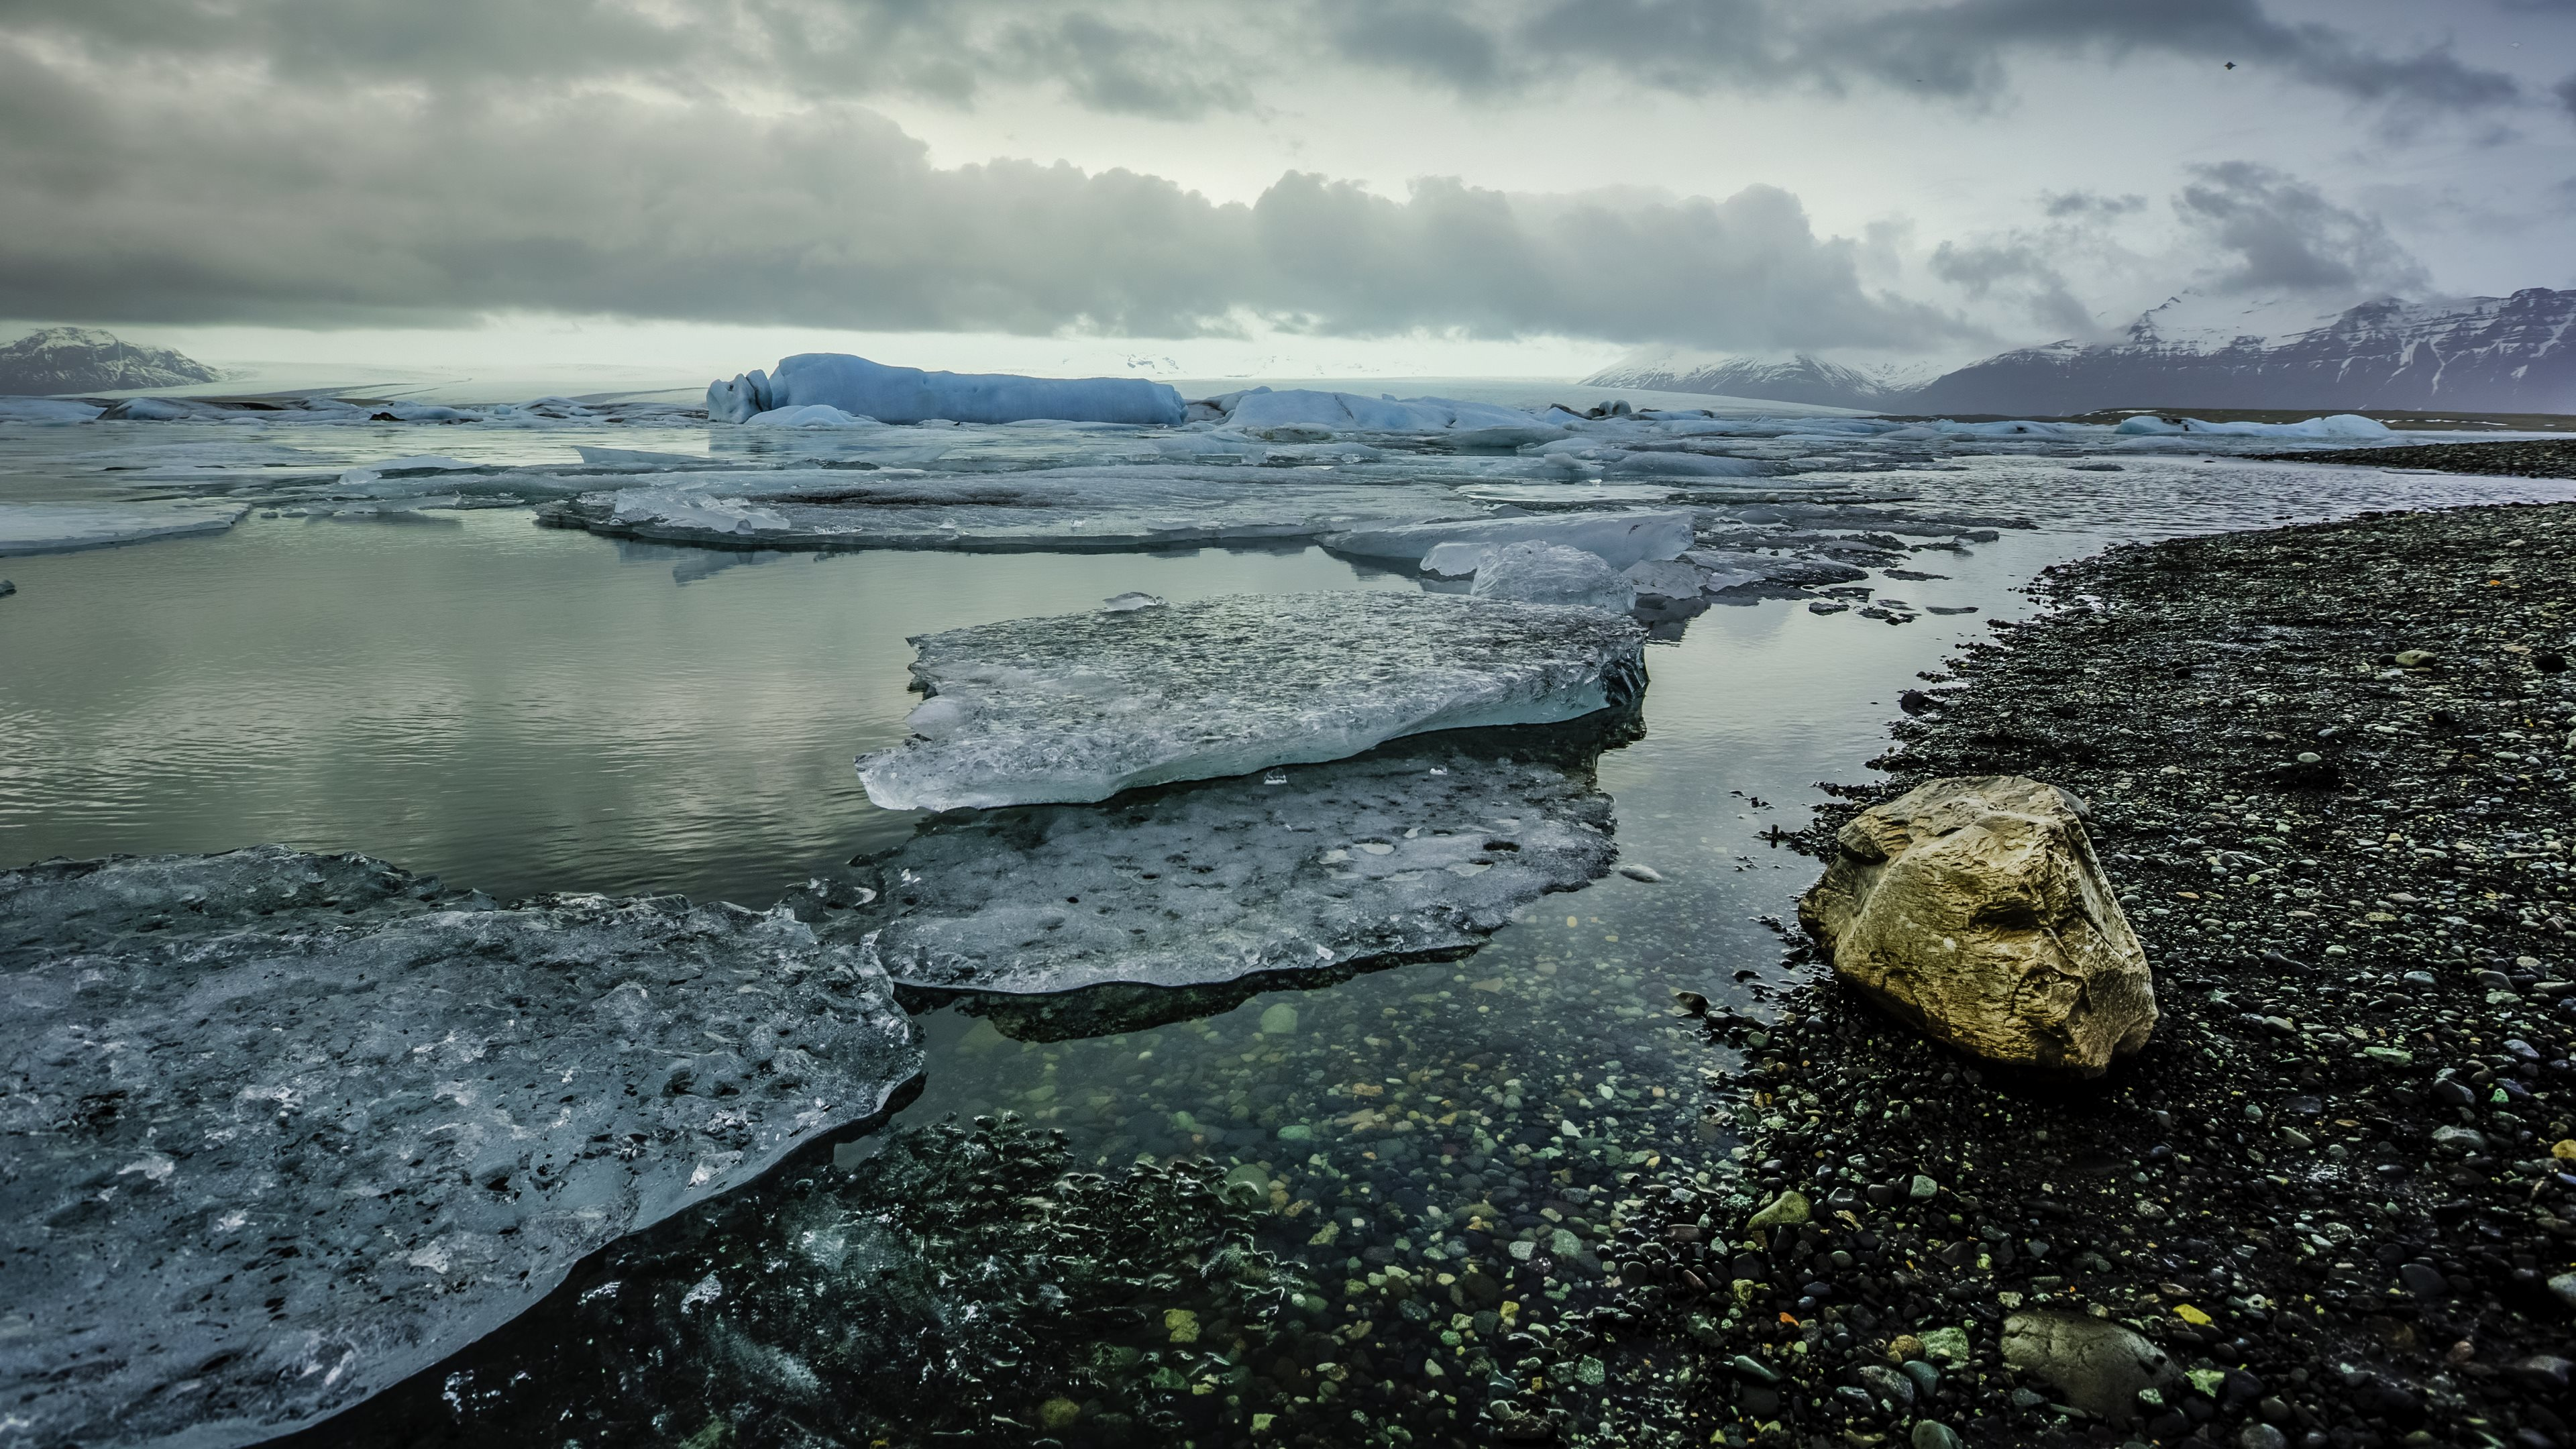 iceland 4k wallpaper - photo #3